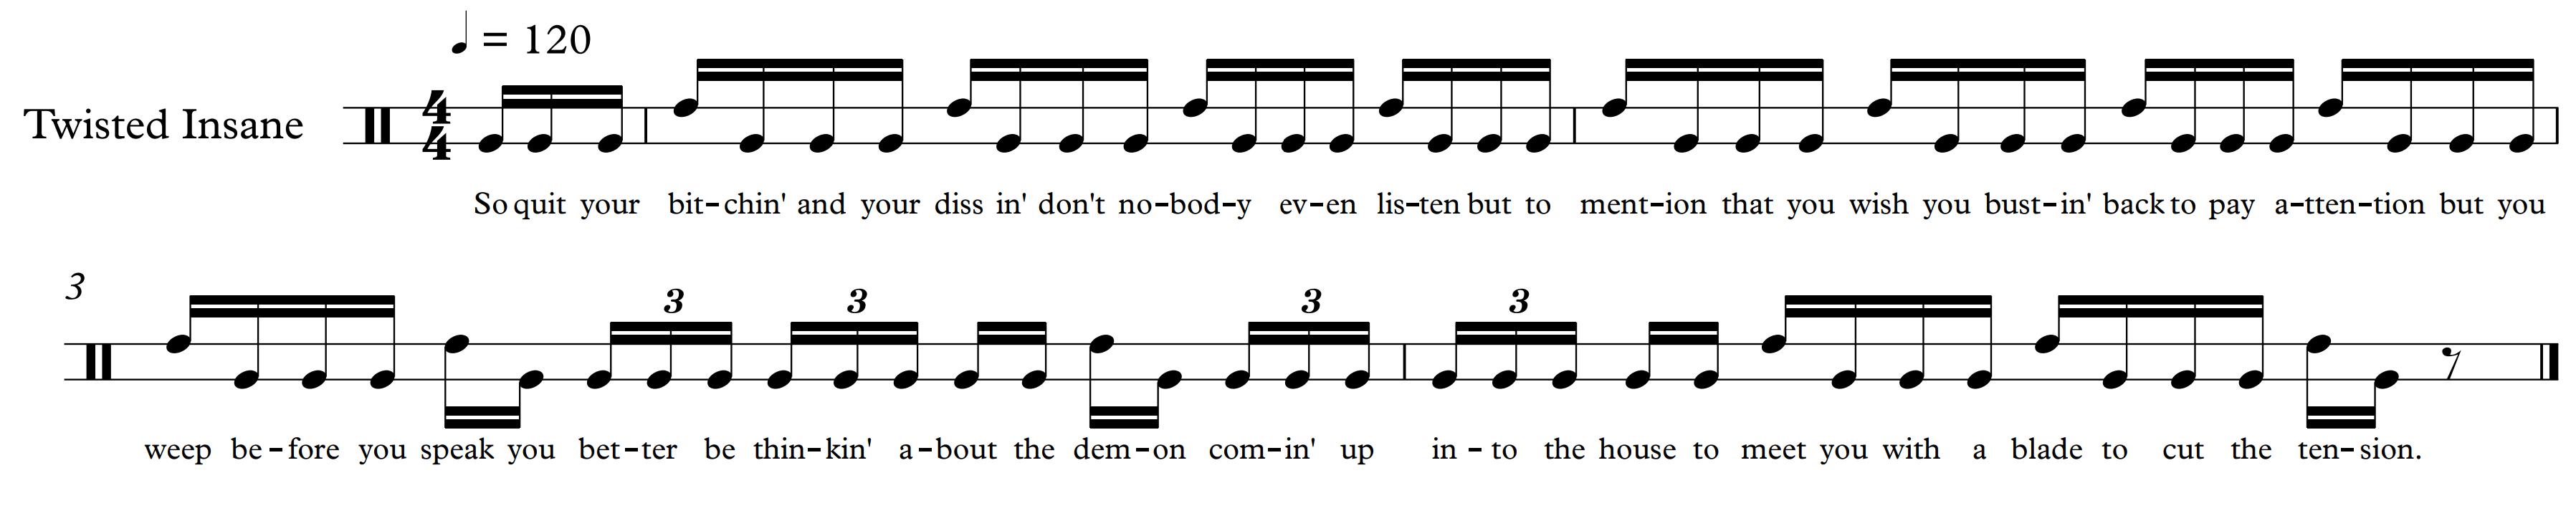 Komaniecki, Example 11